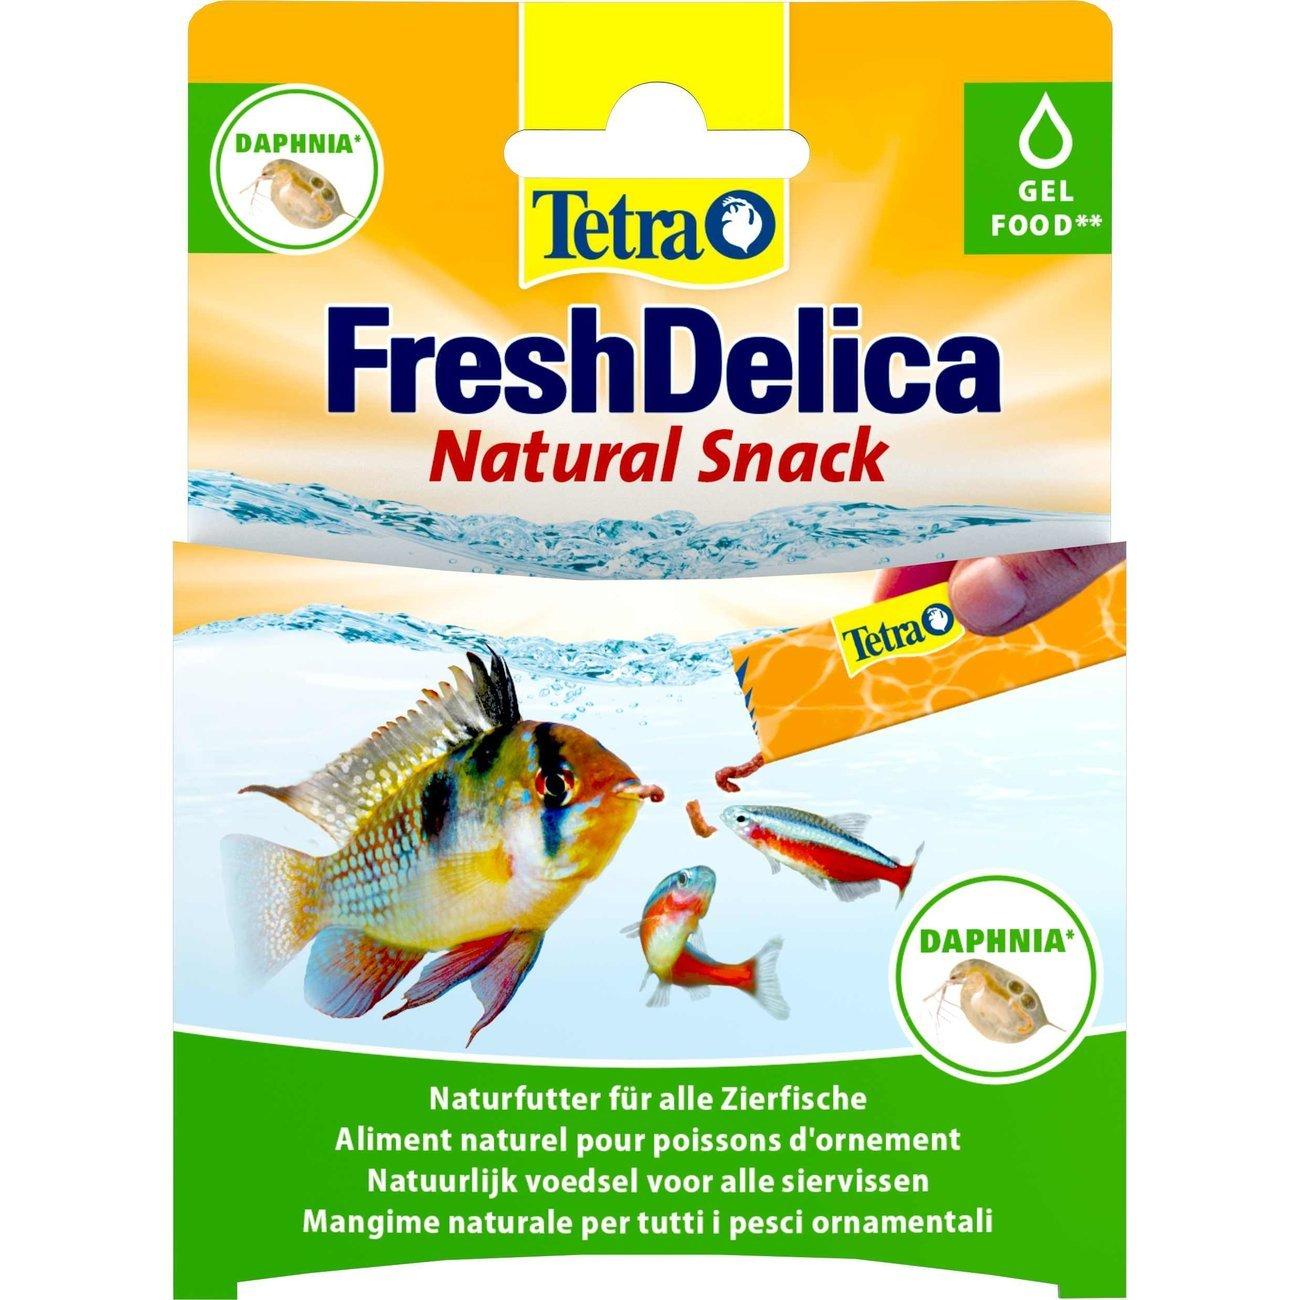 Tetra FreshDelica Gelee, Daphnien, 48 g